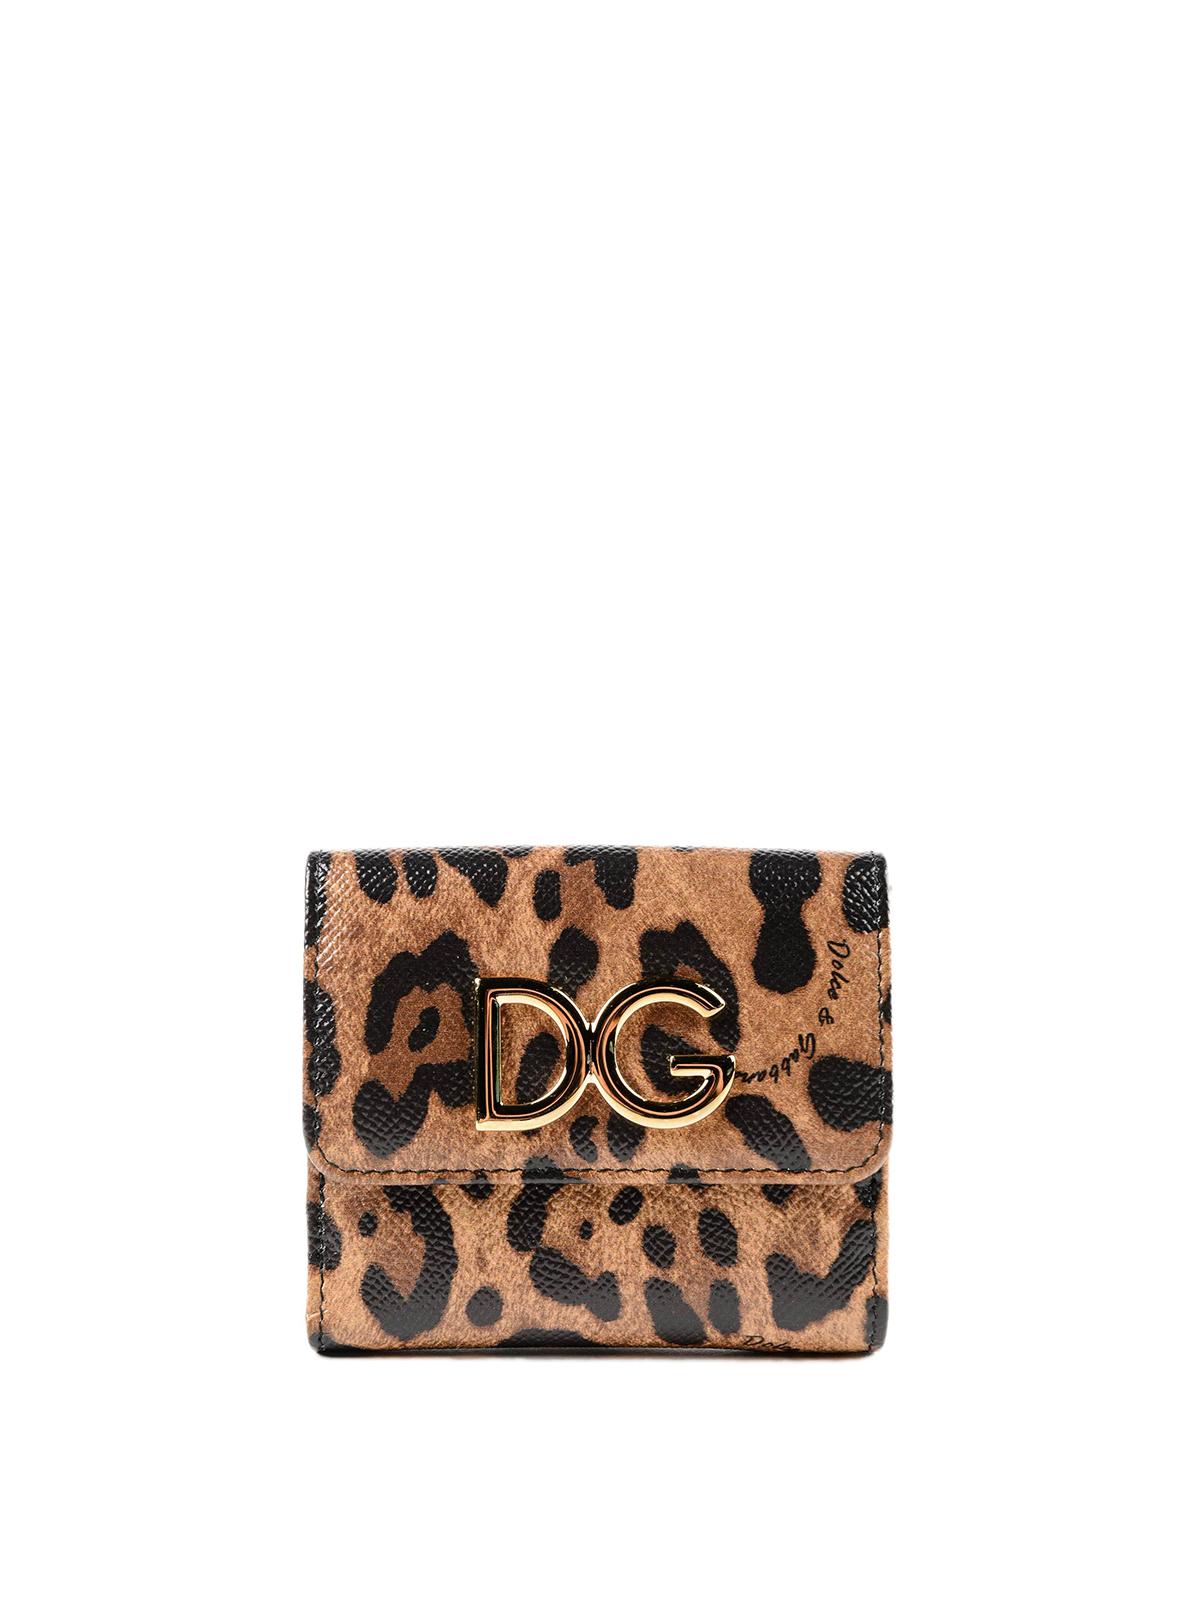 new styles 70c2b ed06f Alla Francese Portafoglio Stampa In Dolceamp; Gabbana Pelle ...